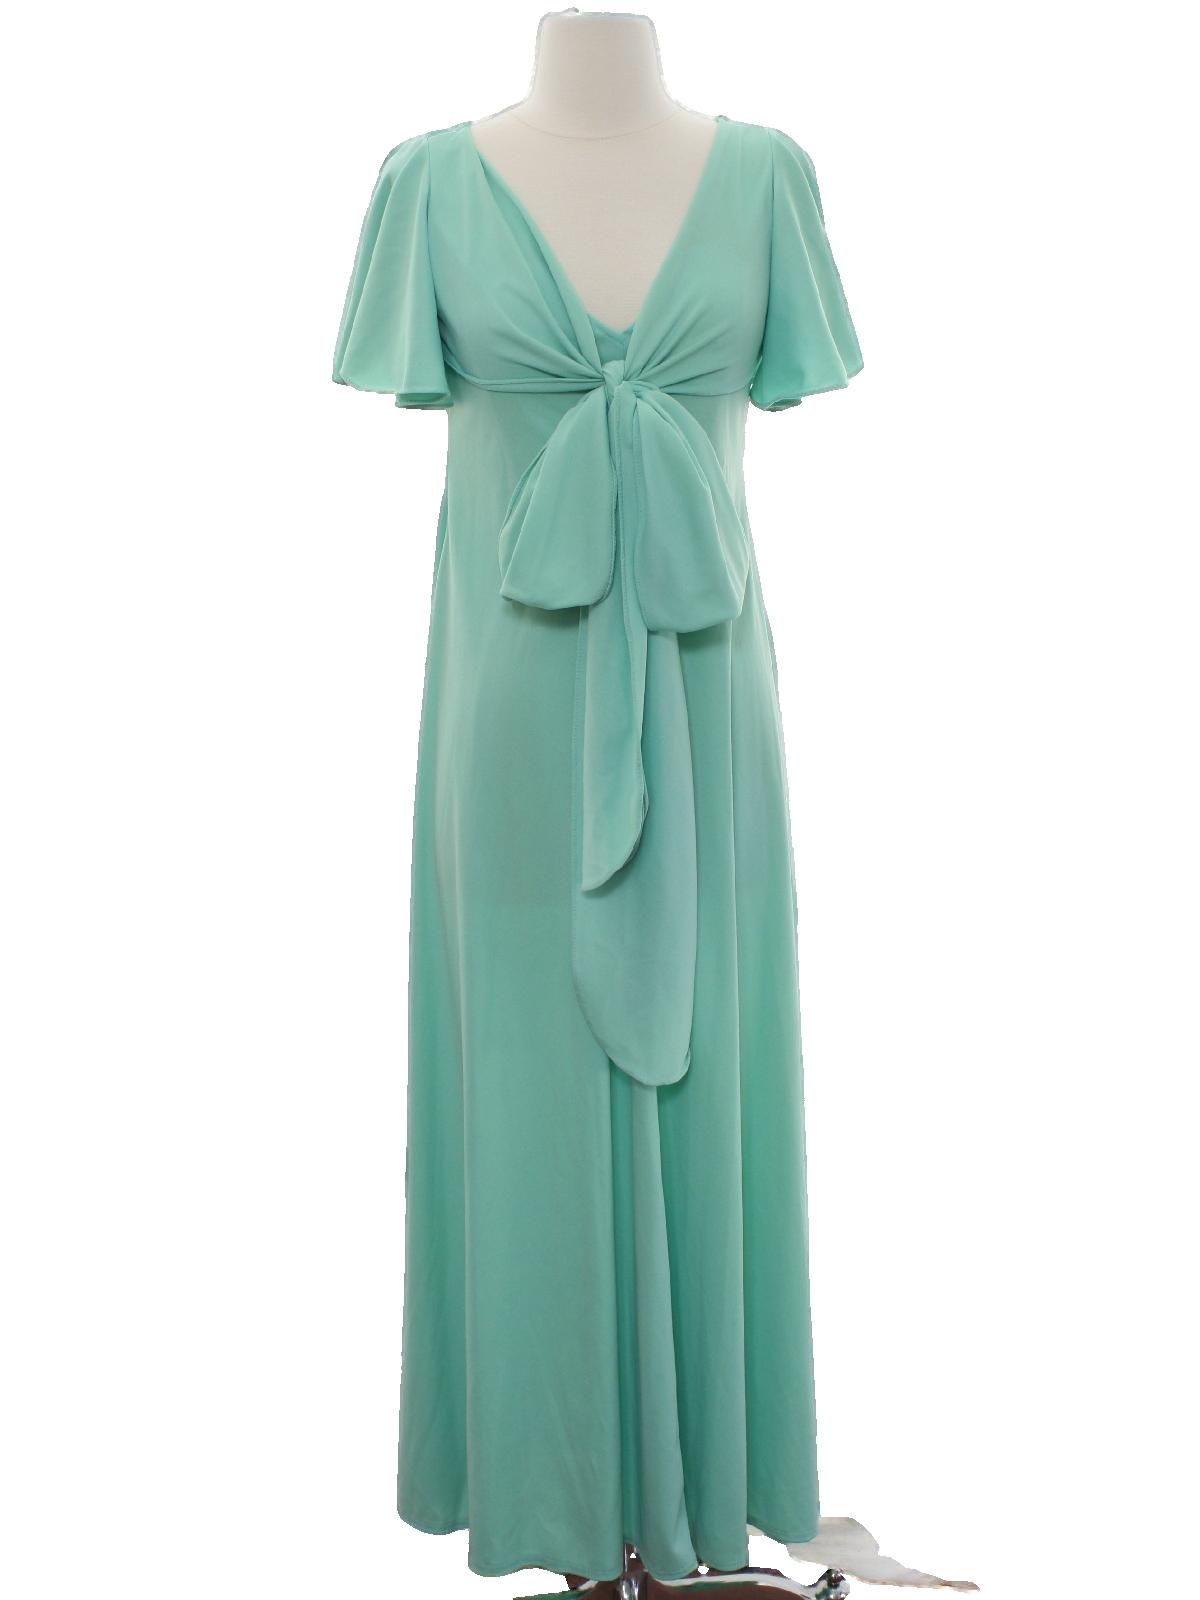 Retro 1970\'s Cocktail Dress: 70s -No Label- Womens mint green slinky ...